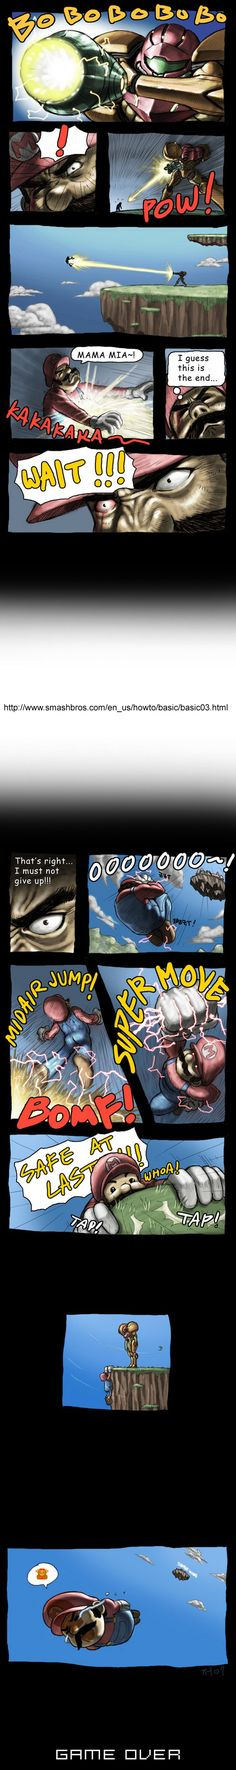 Super Smash Bros comic retry by ~torokun on deviantART